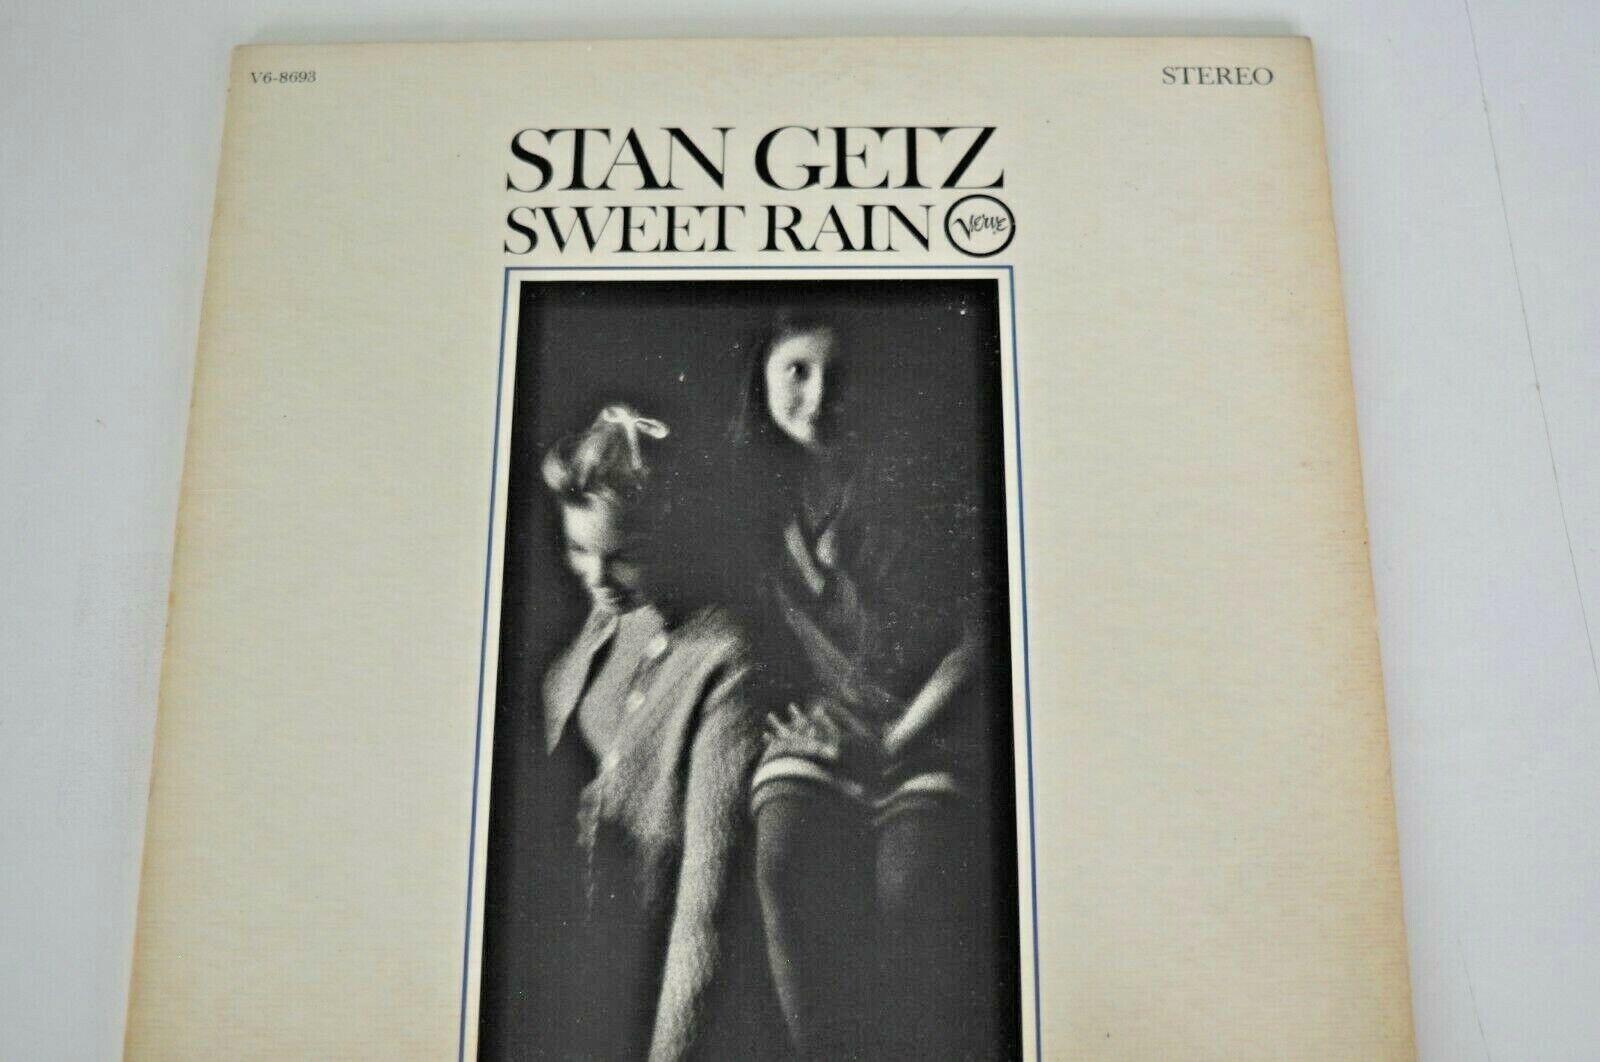 SWEET RAIN BY STAN GETZ ON GATEFOLD VERVE RECORDS  - $9.99